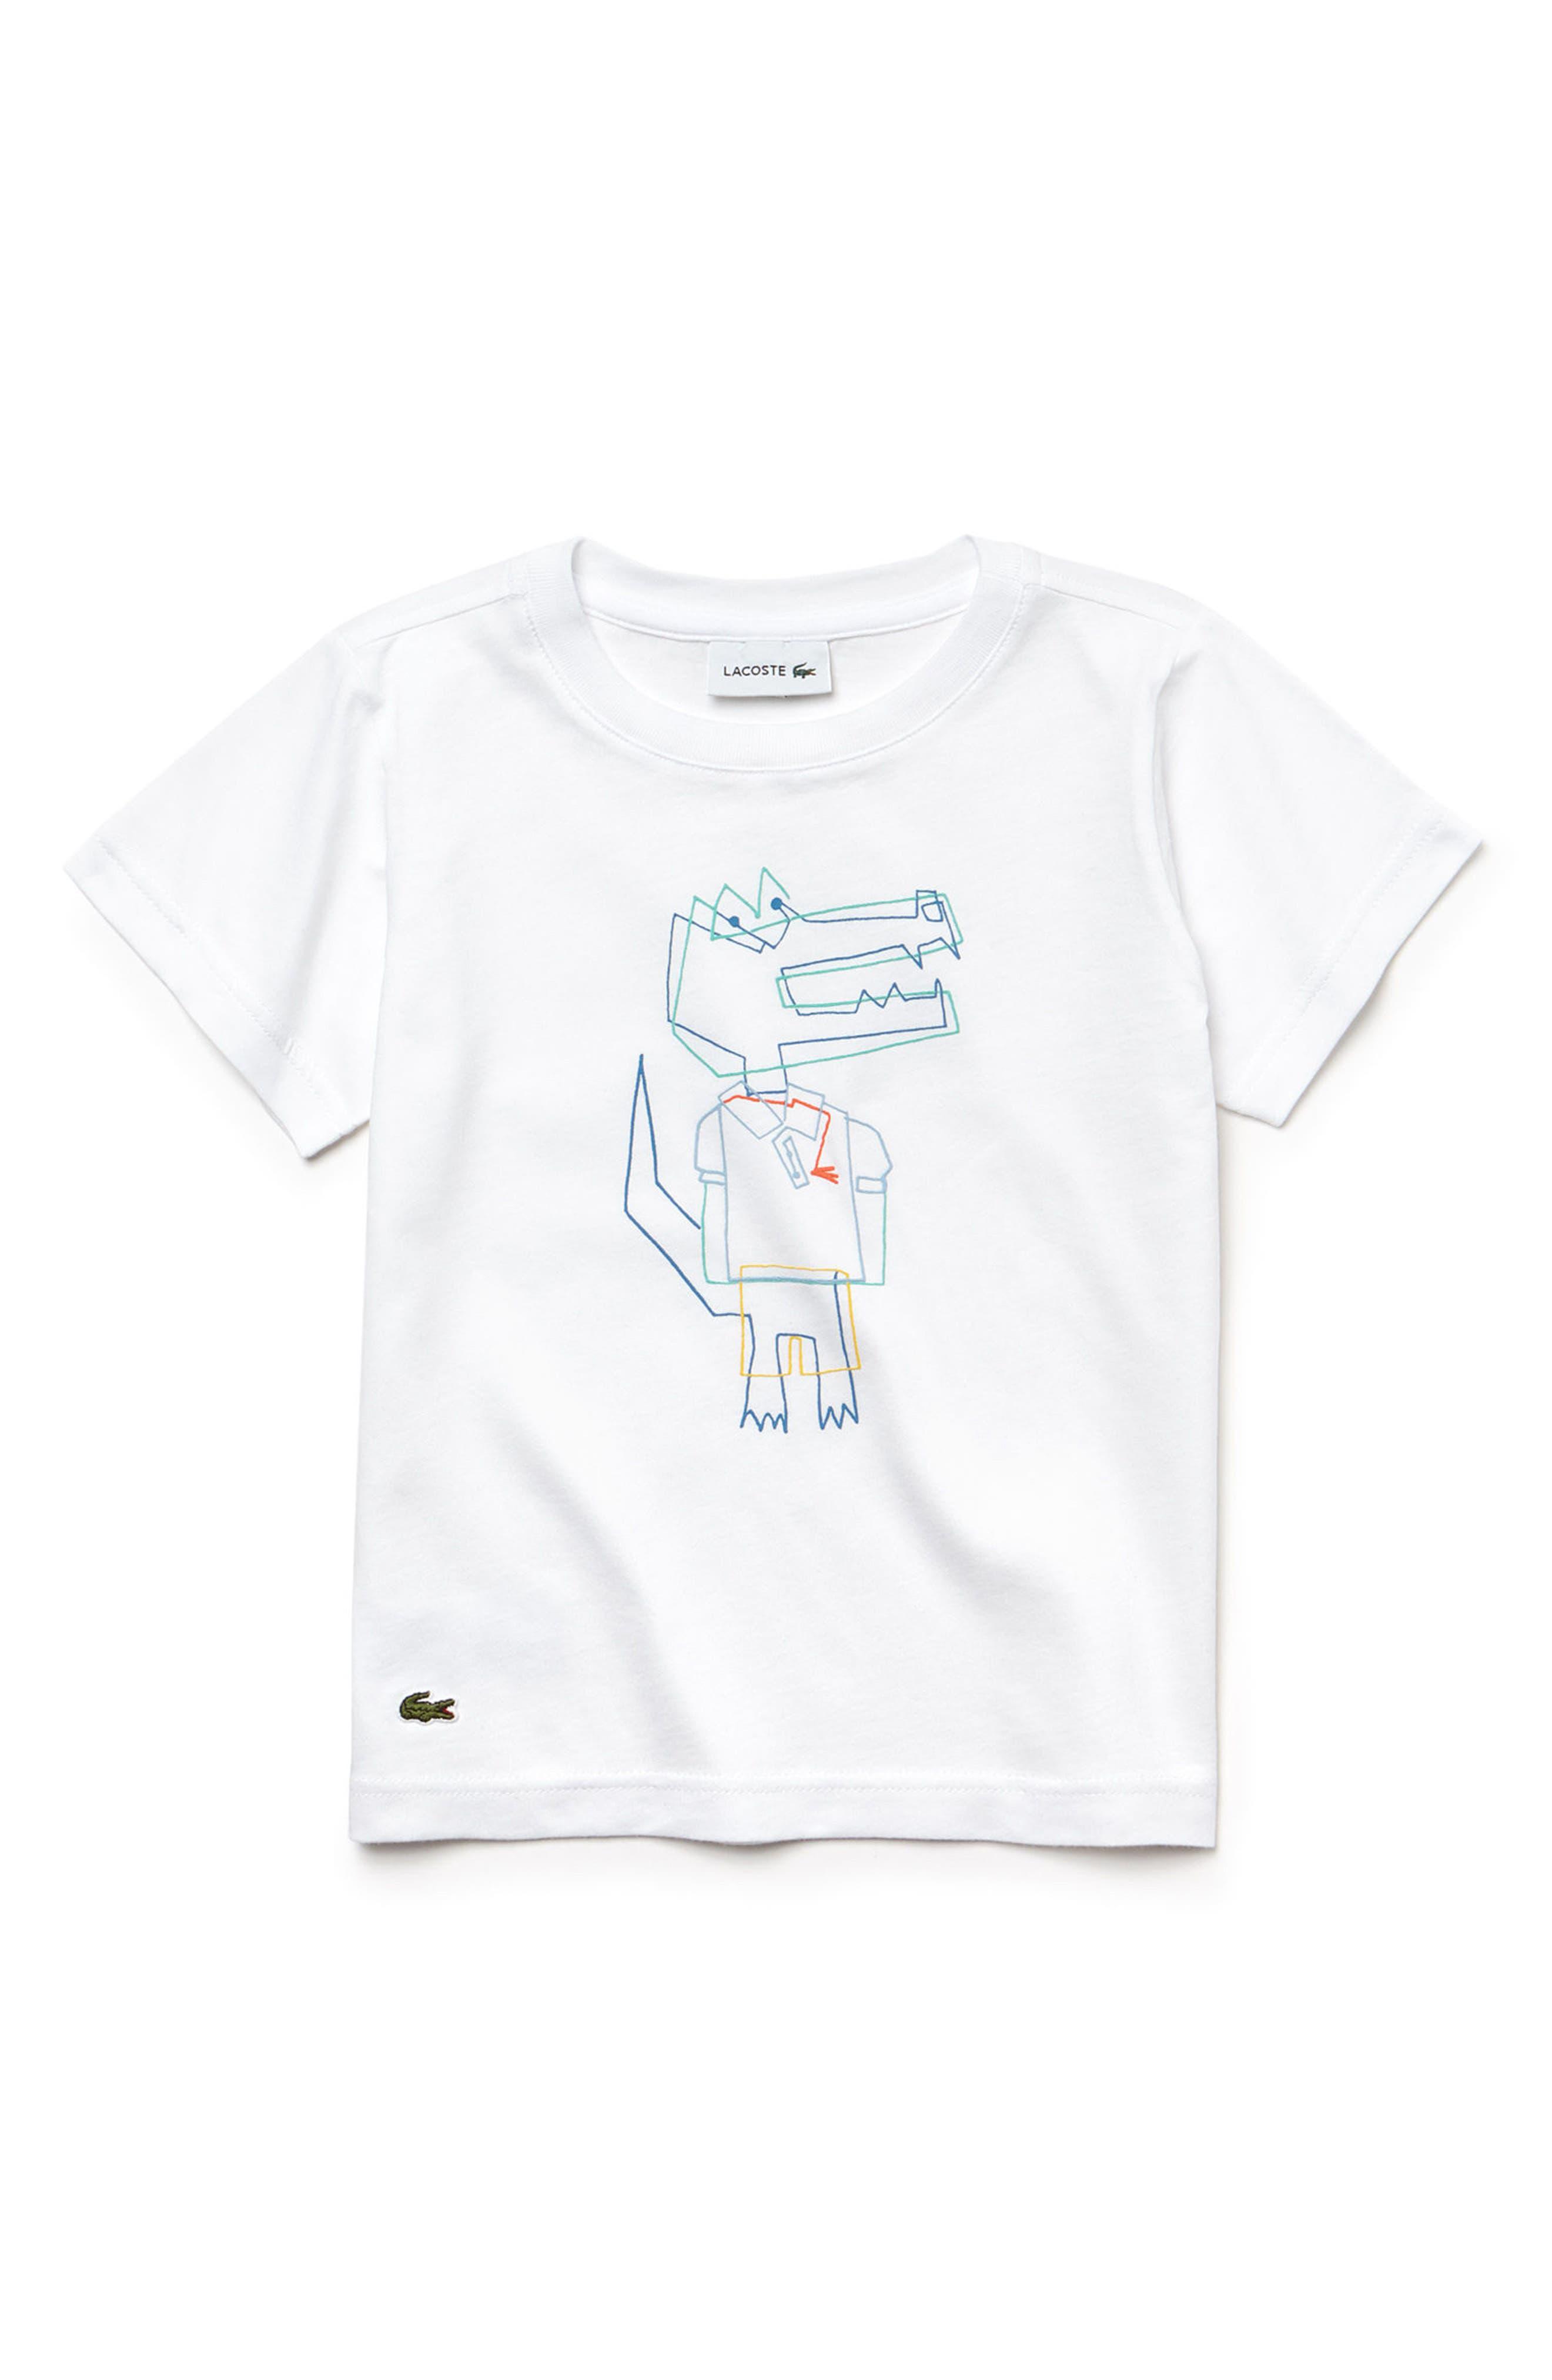 Main Image - Lacoste Crocoline Graphic T-Shirt (Toddler Boys & Little Boys)